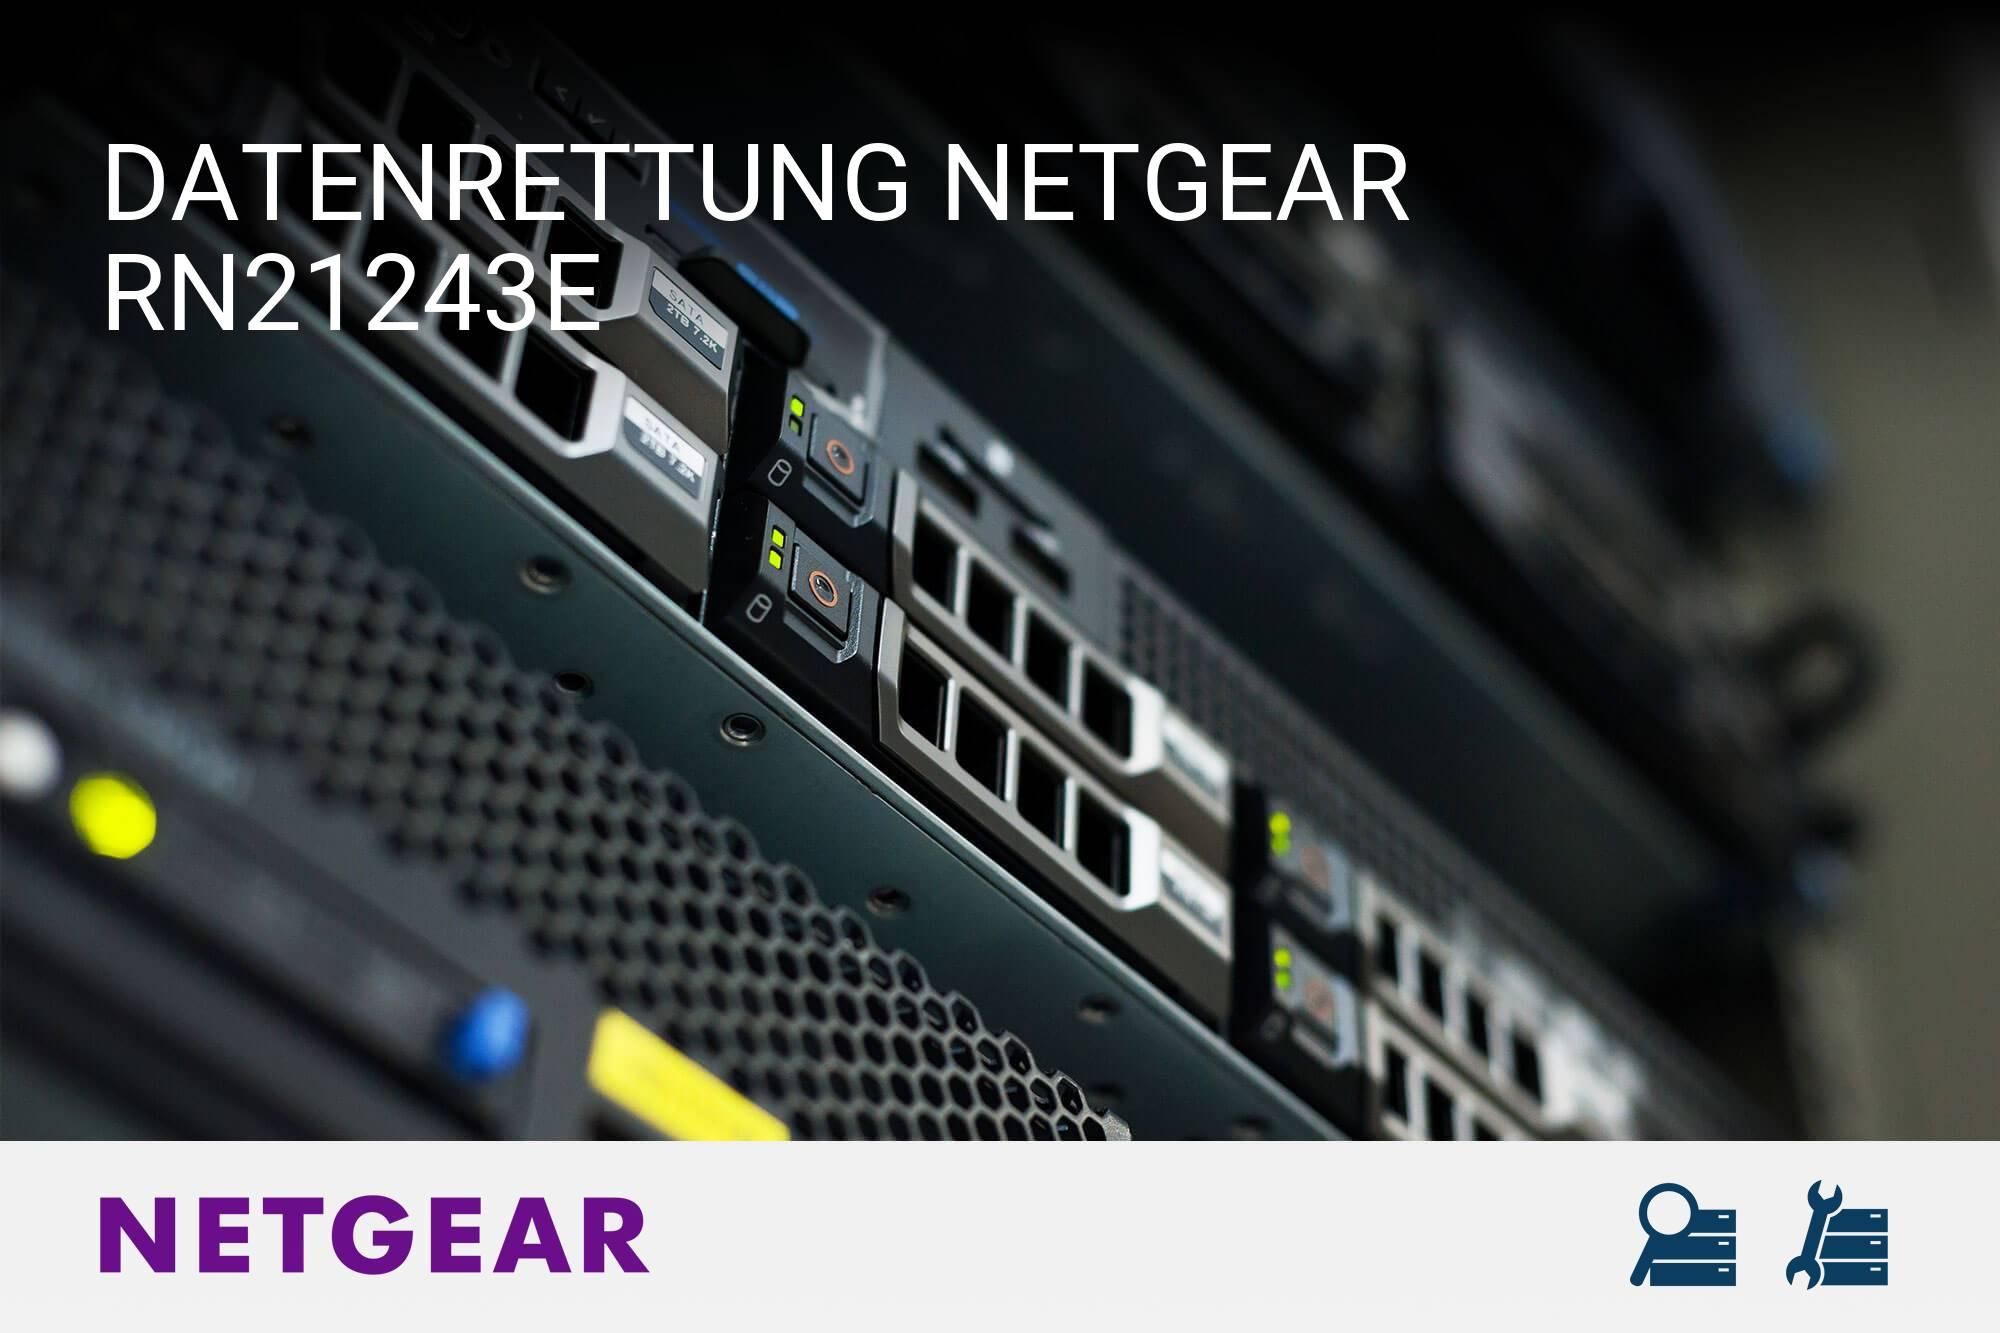 Netgear RN21243E